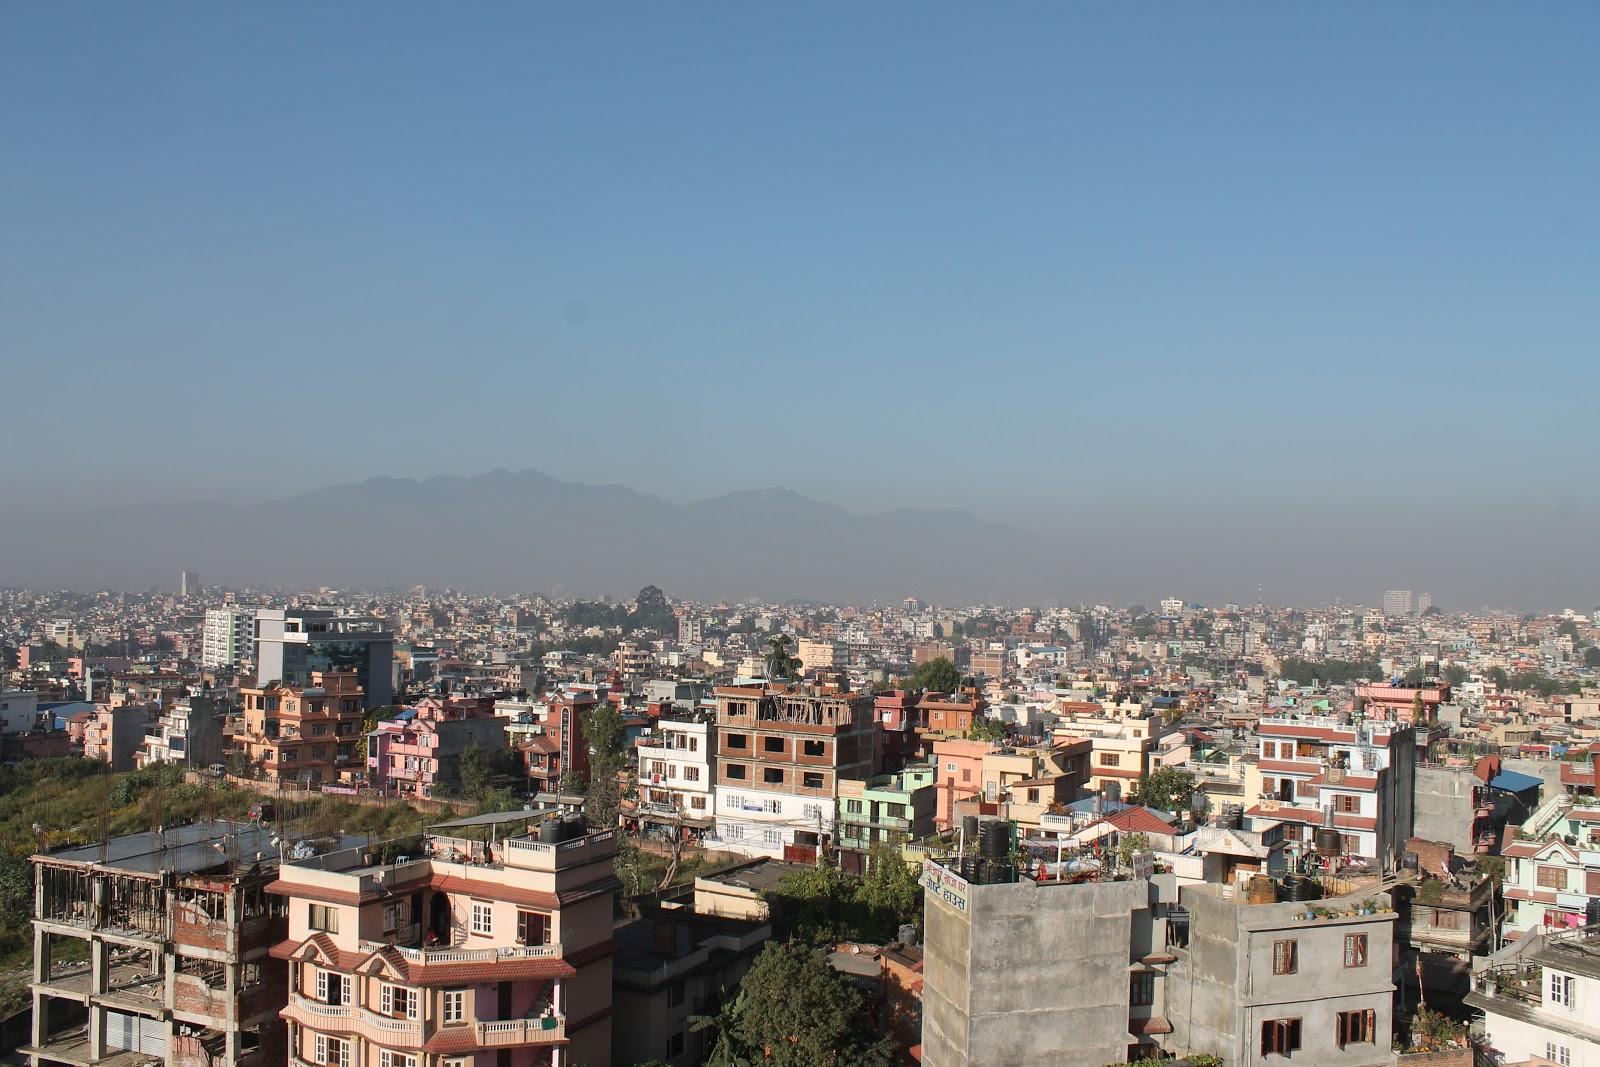 Shashcha Blog Nepal Surpriseswell - Poor country name